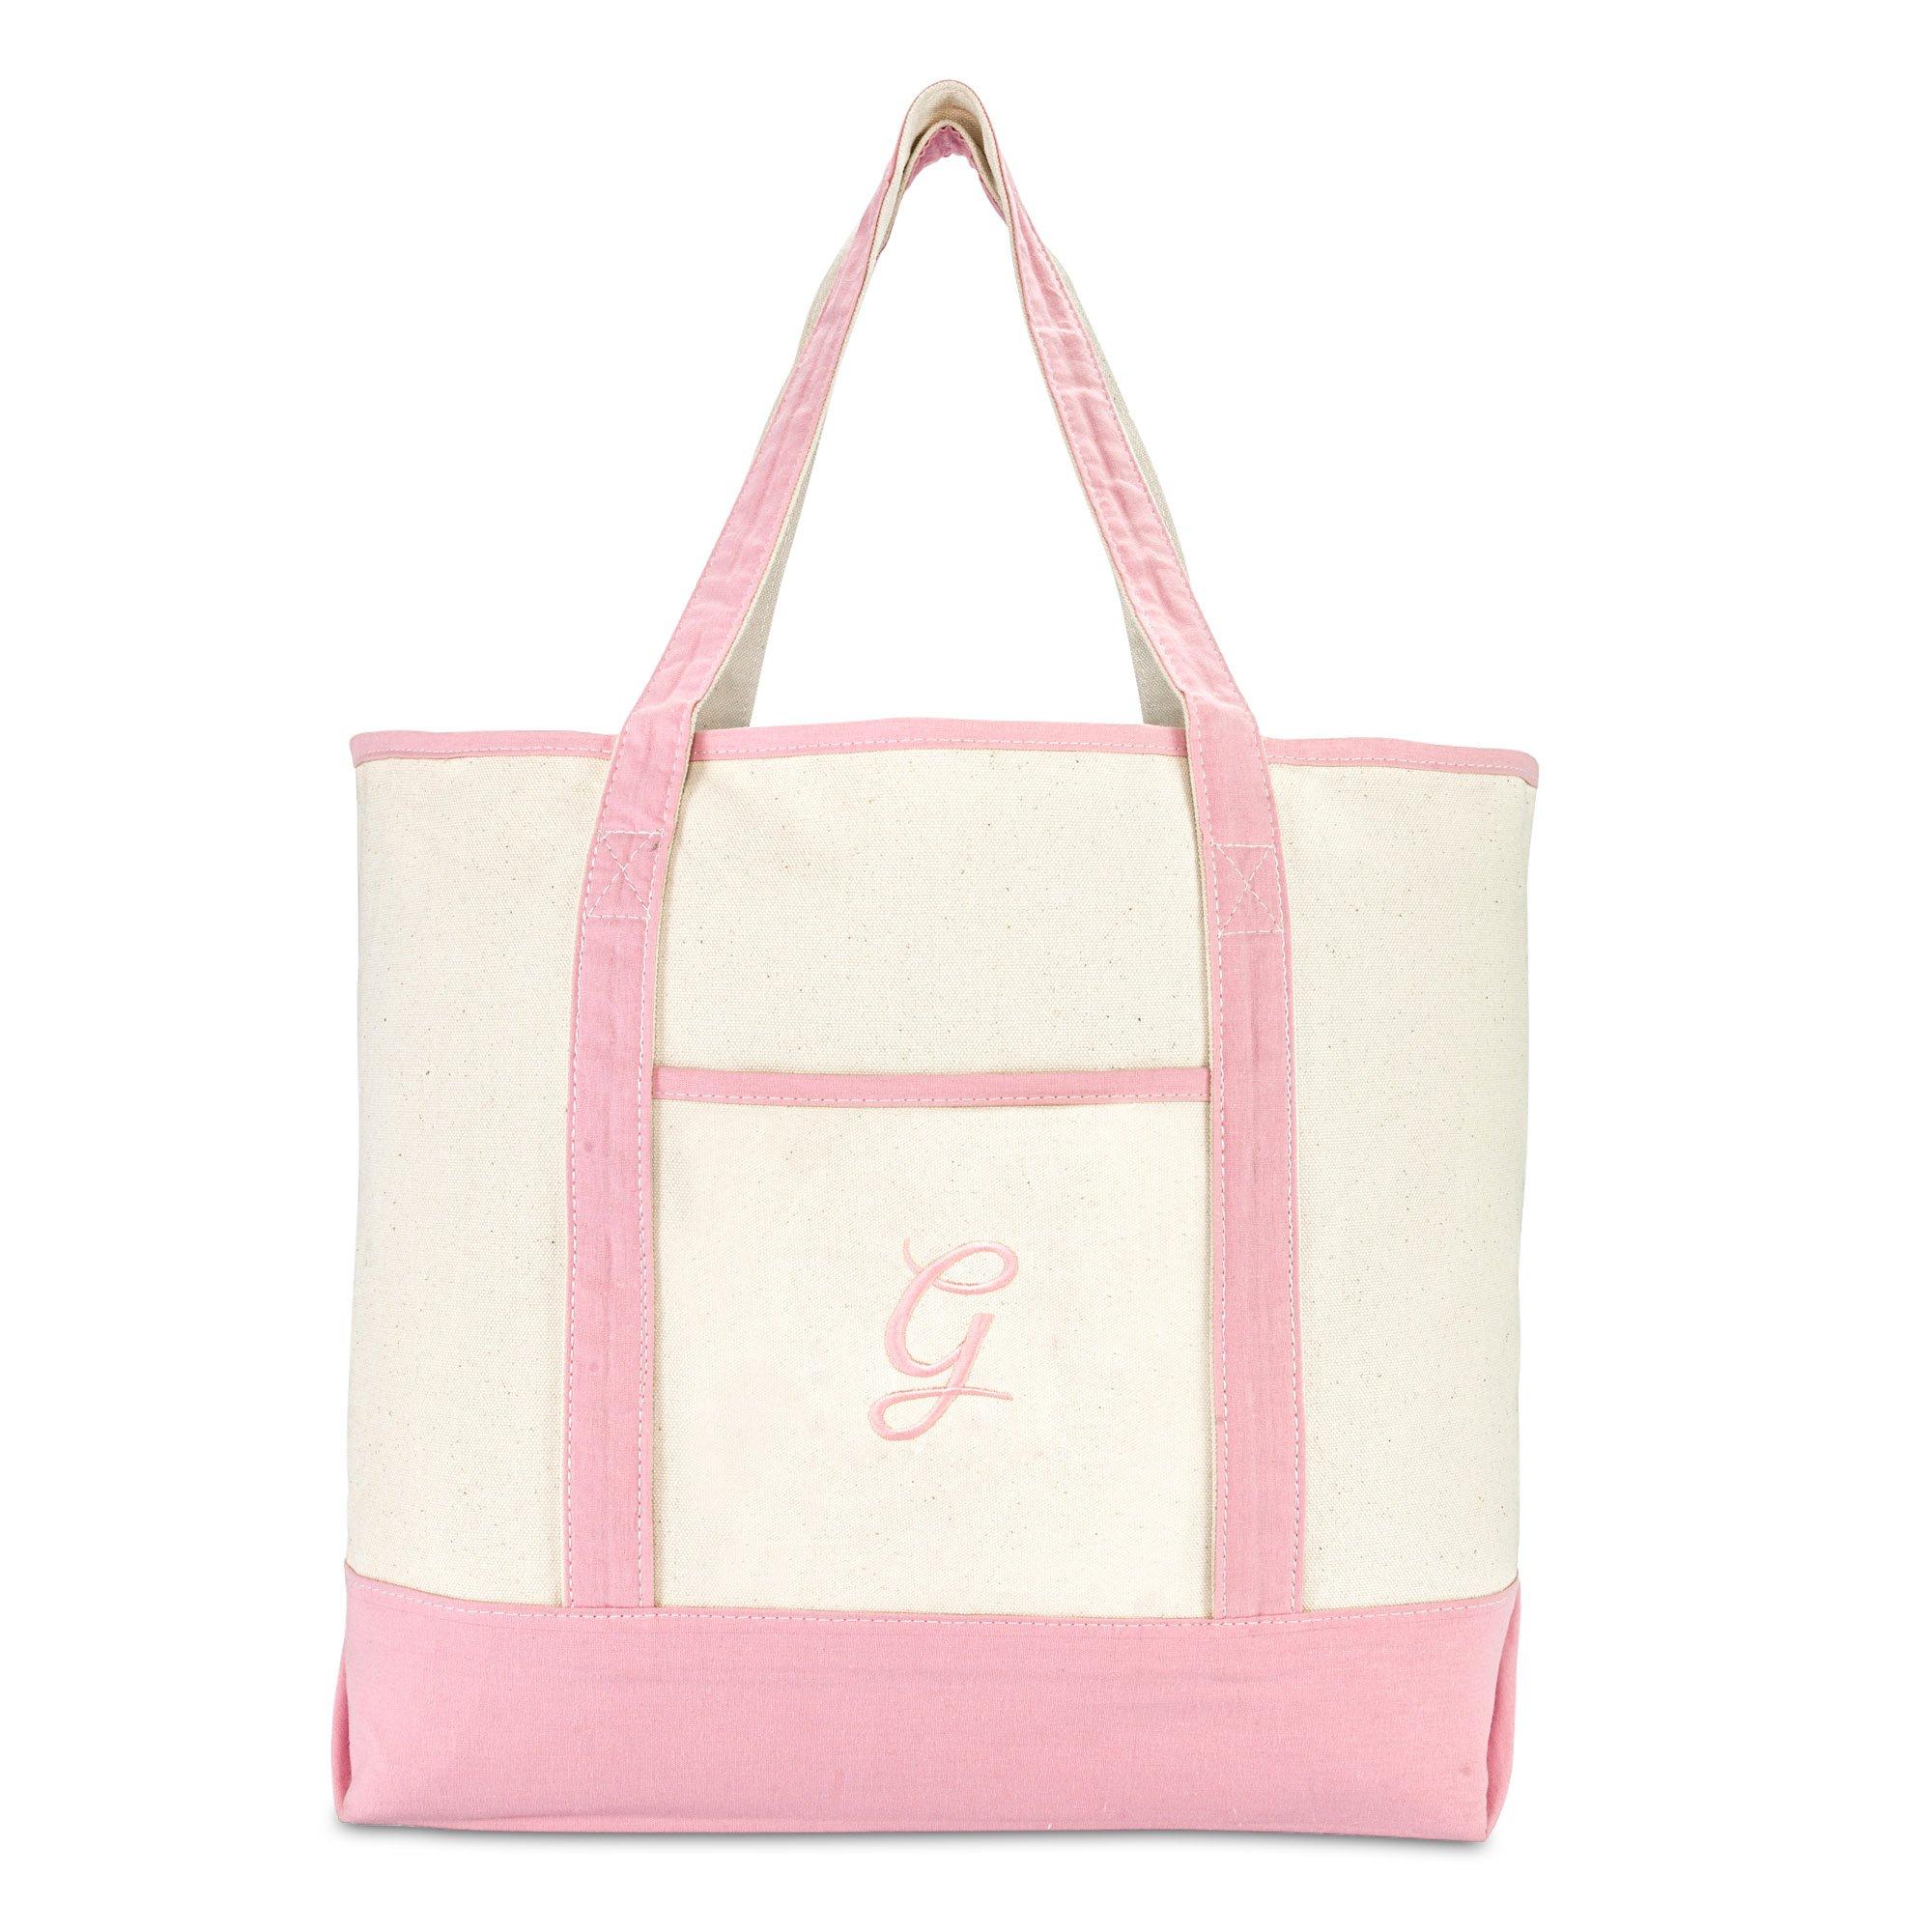 DALIX Women's Cotton Canvas Tote Bag Large Shoulder Bags Pink Monogram G by DALIX (Image #3)